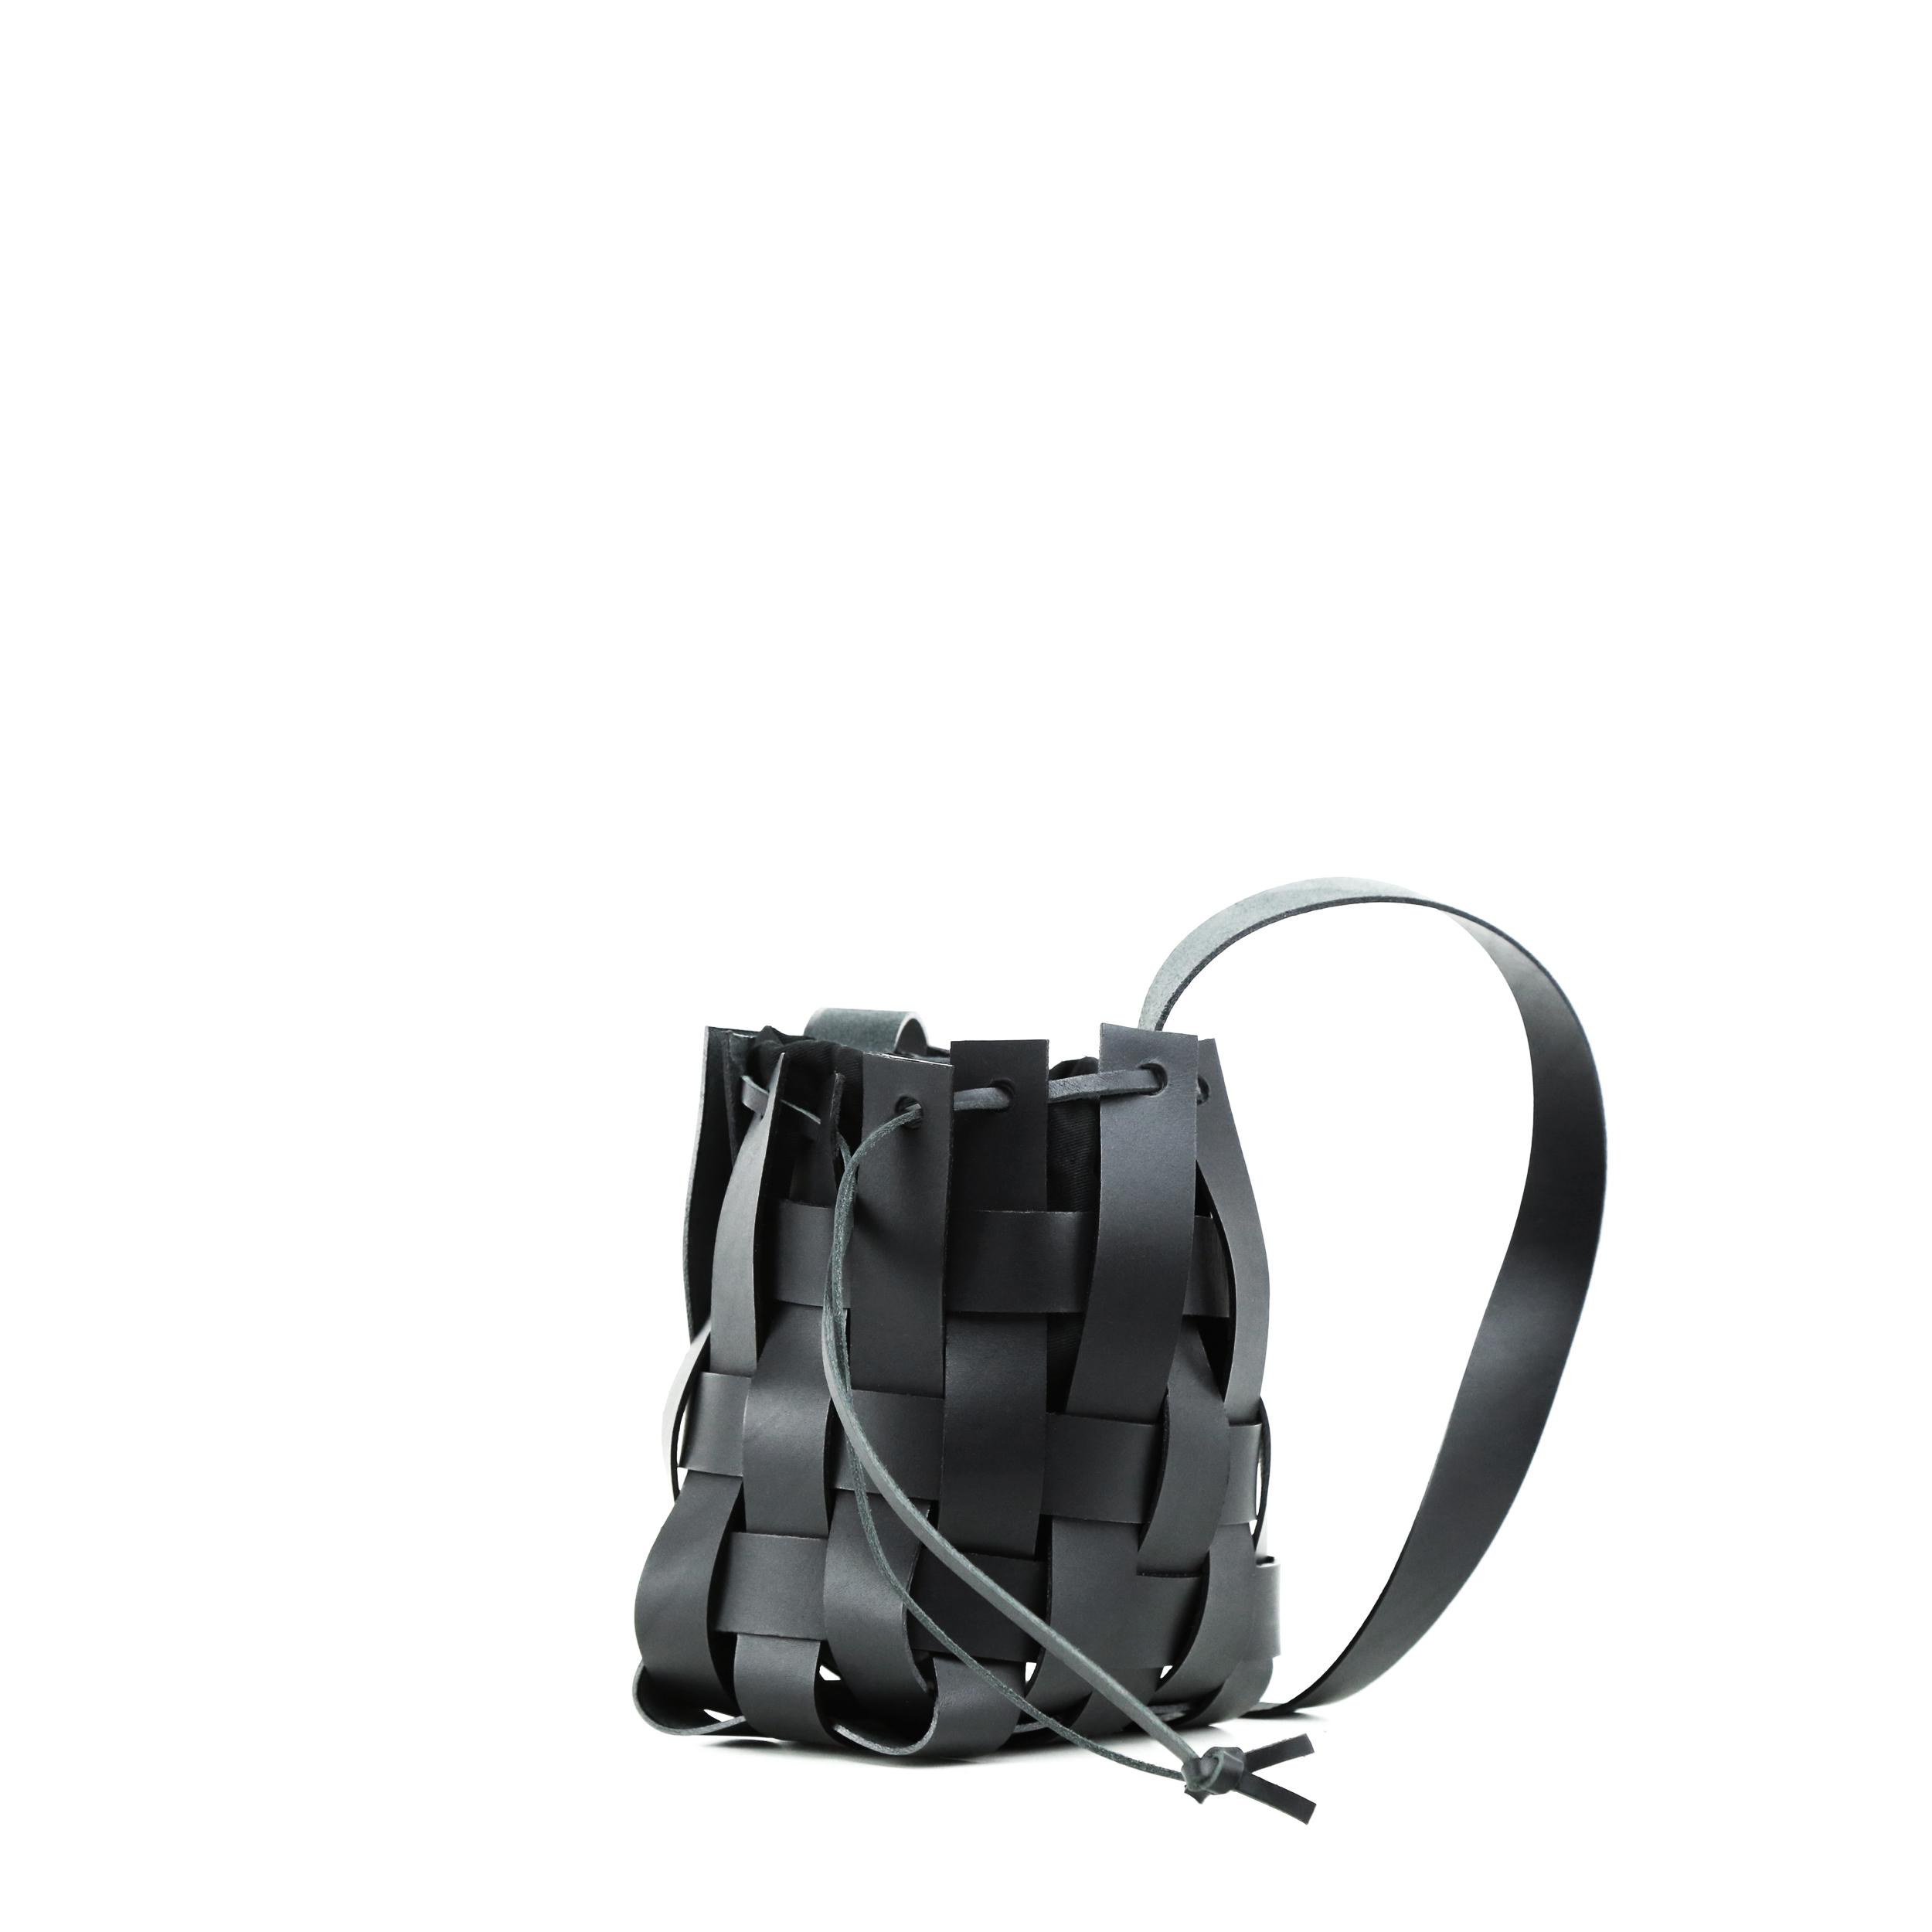 Torba-PANE-Woven-Basket-Bag-Black-3